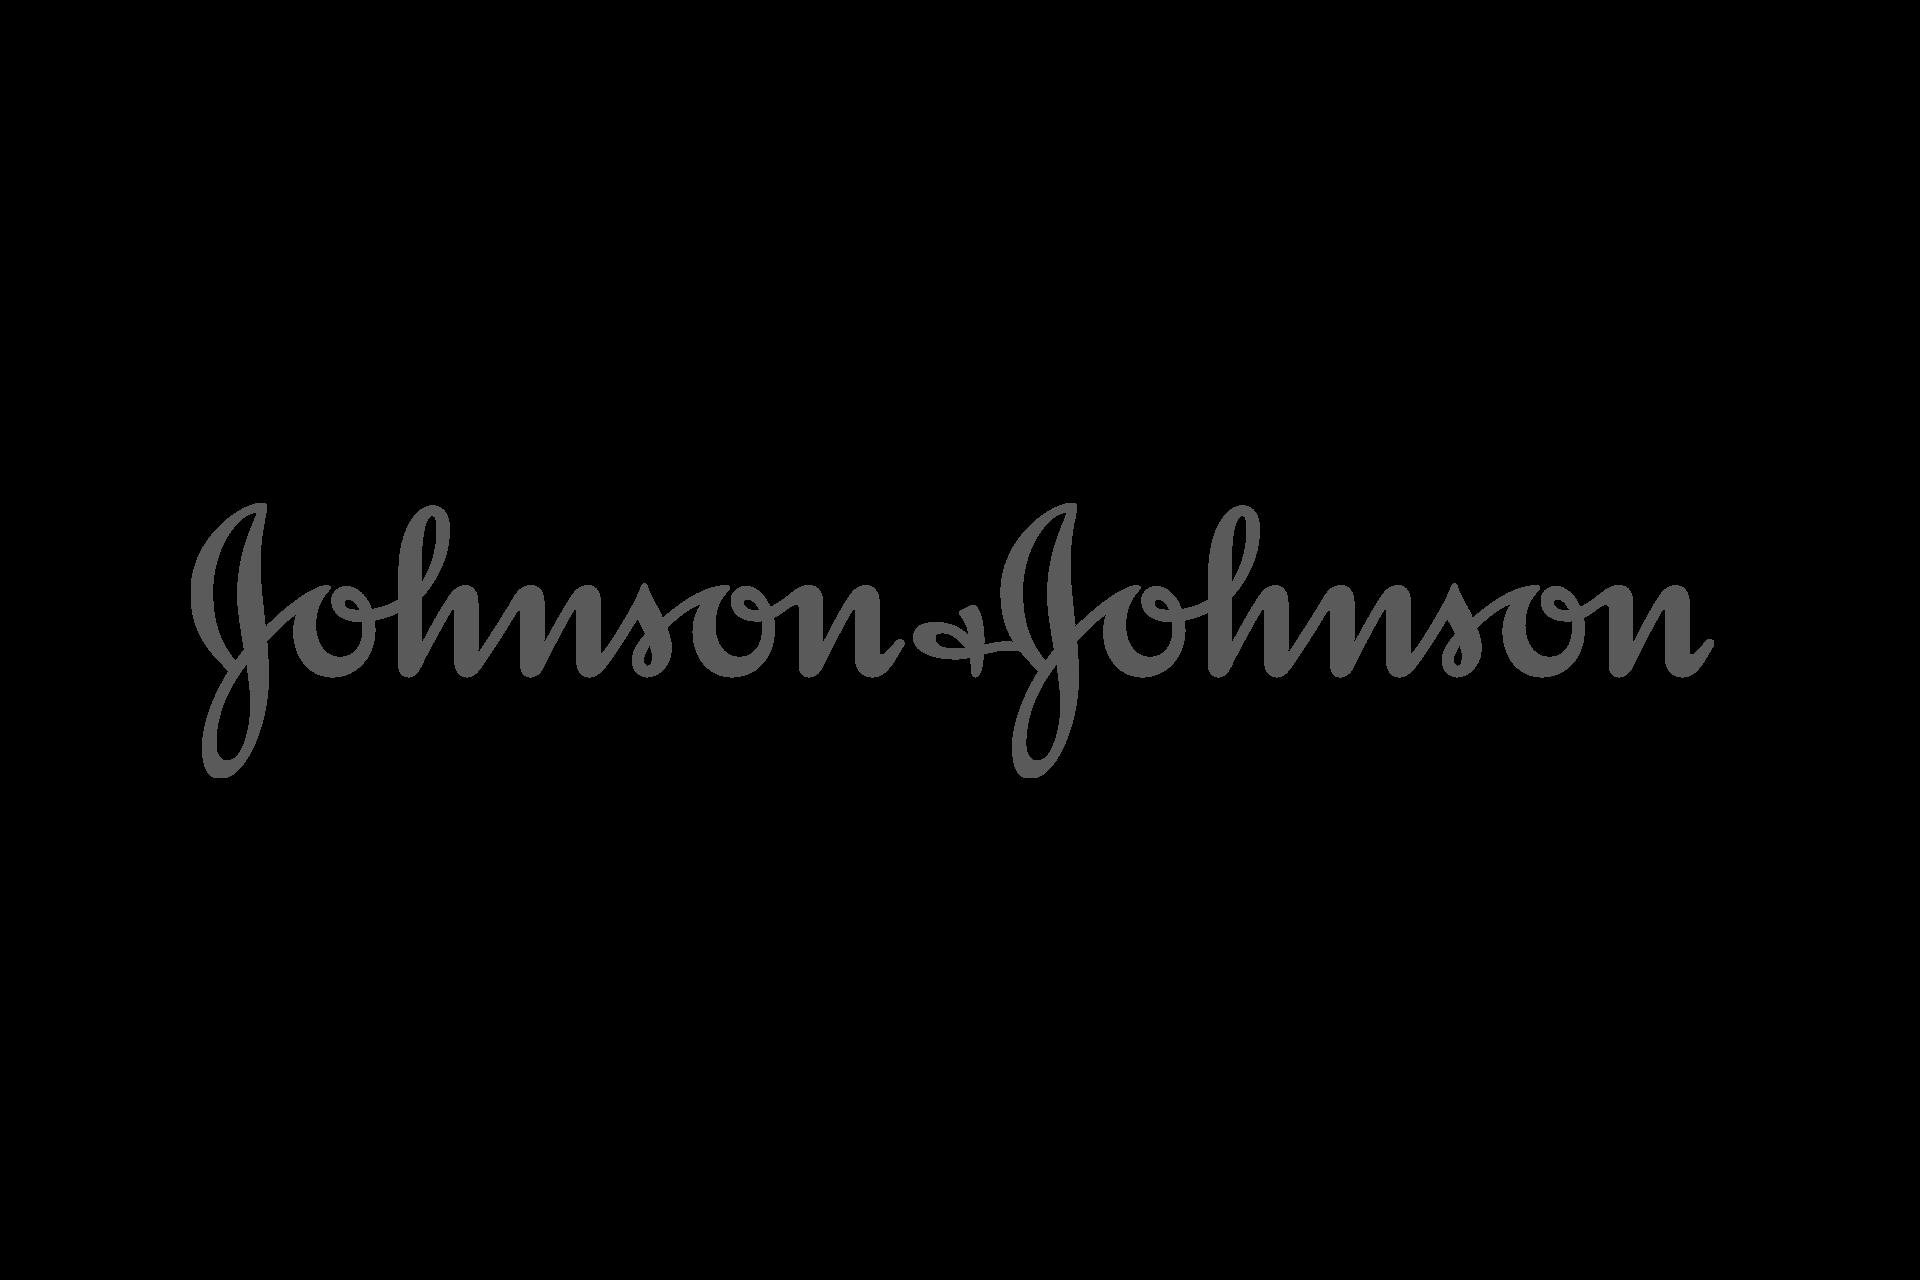 johnsonandjohnson referenz jentner metallveredelung logo sw